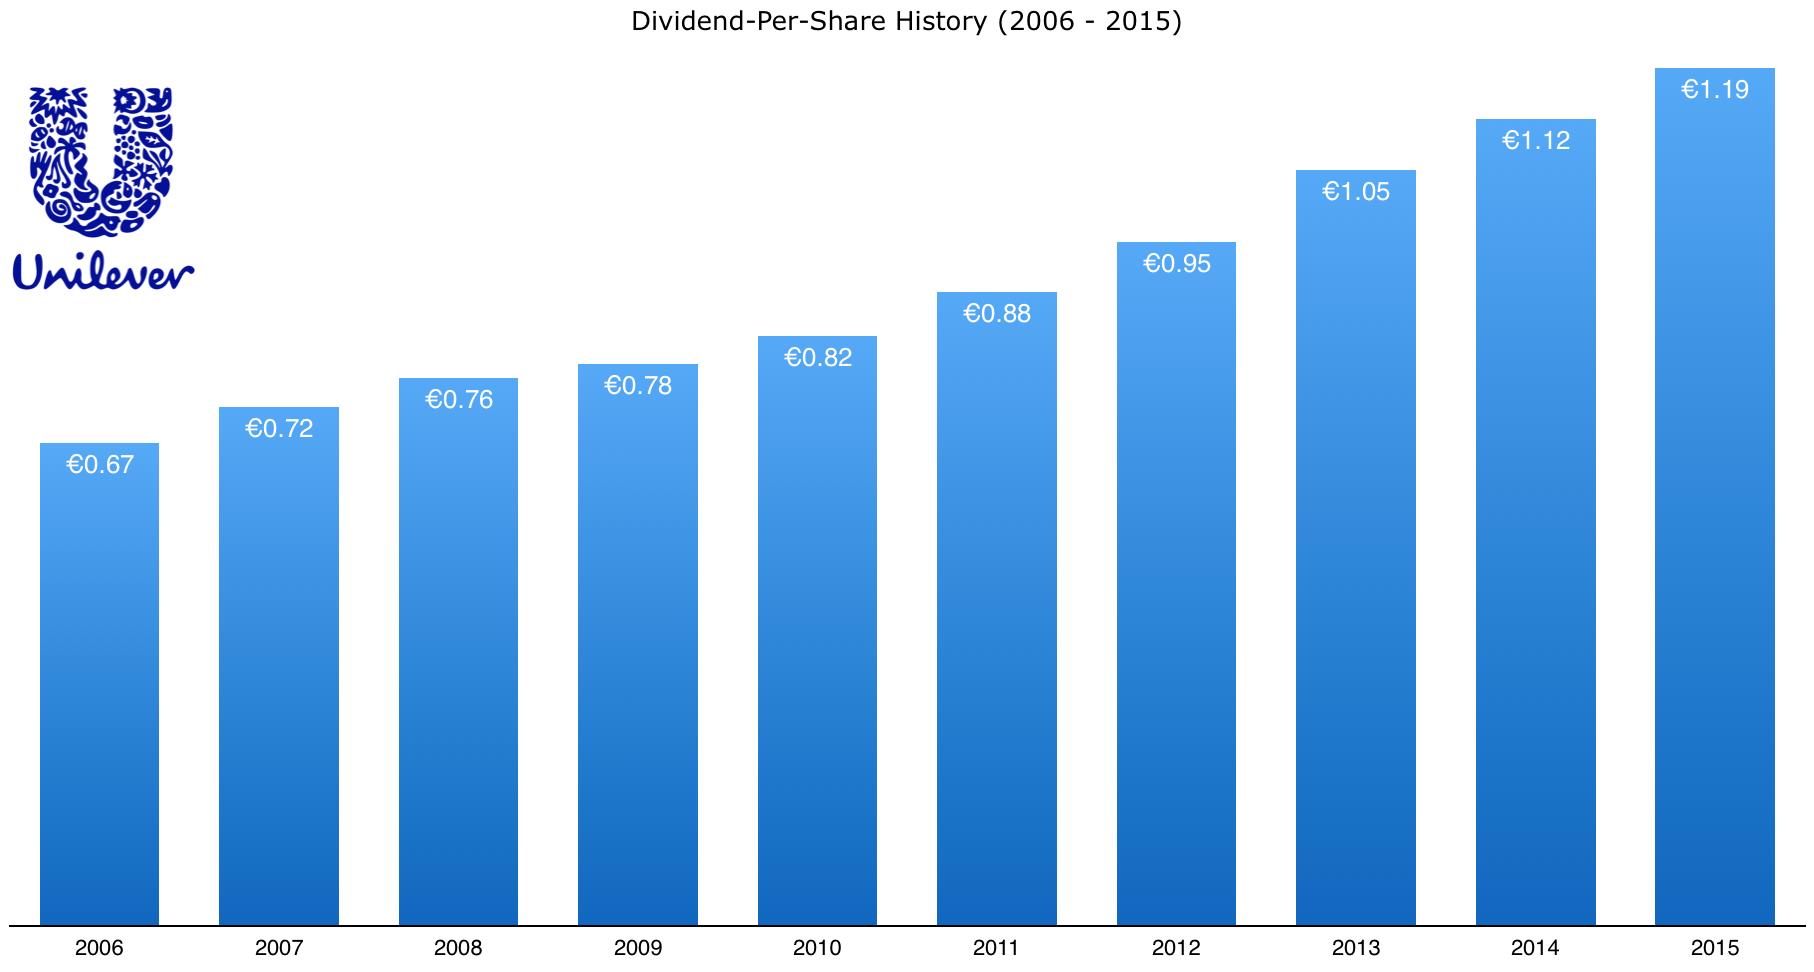 unilever_dividend_history